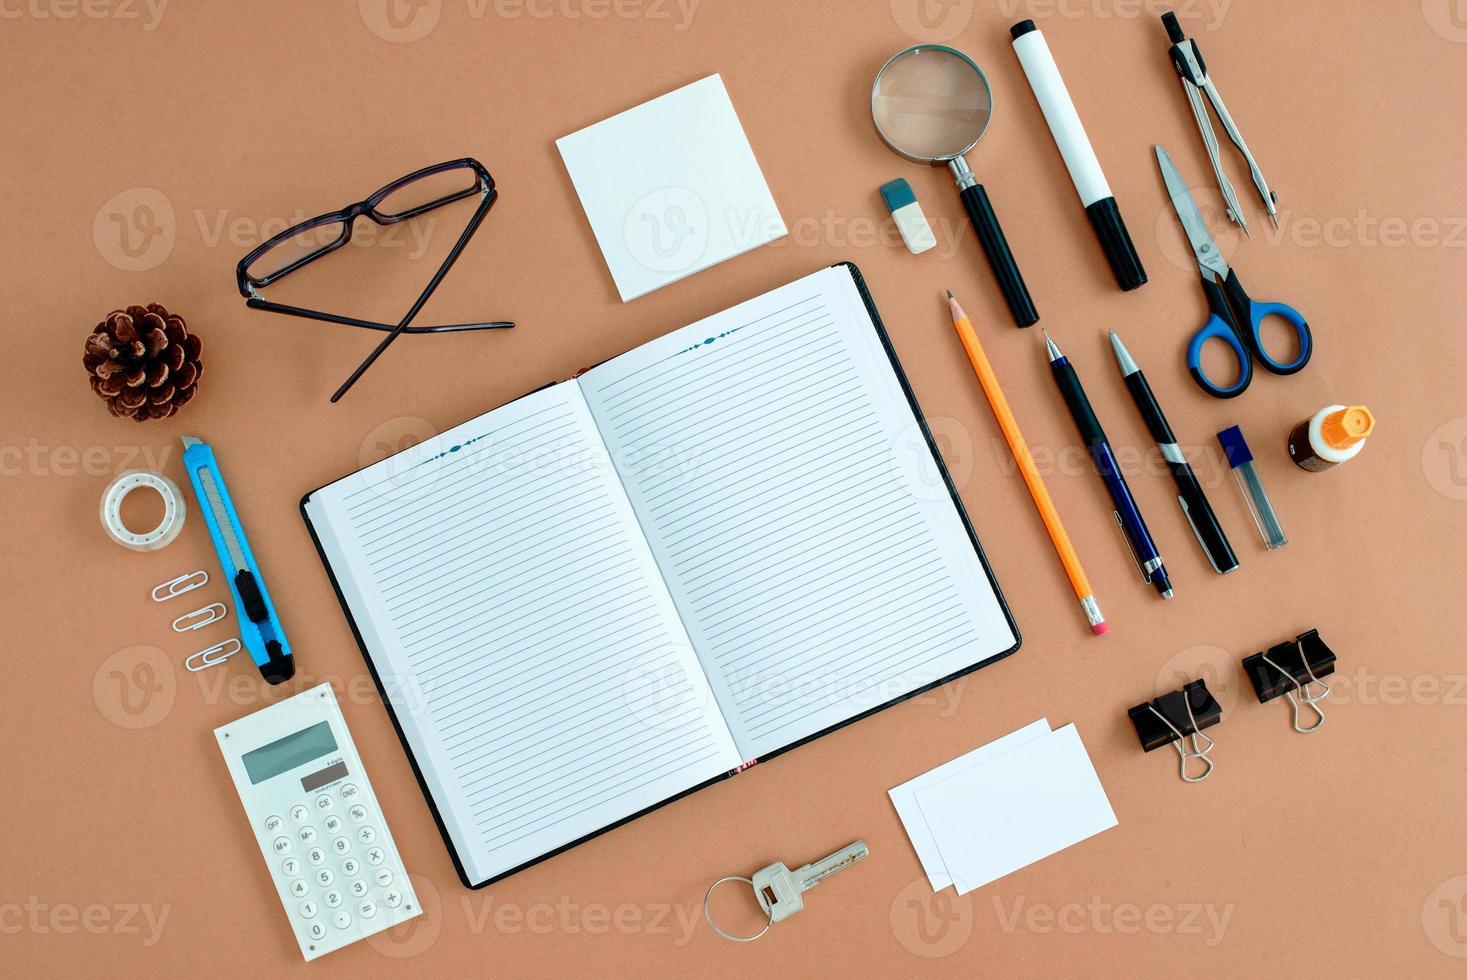 Office Supplies Neatly Organized Around Notebook photo